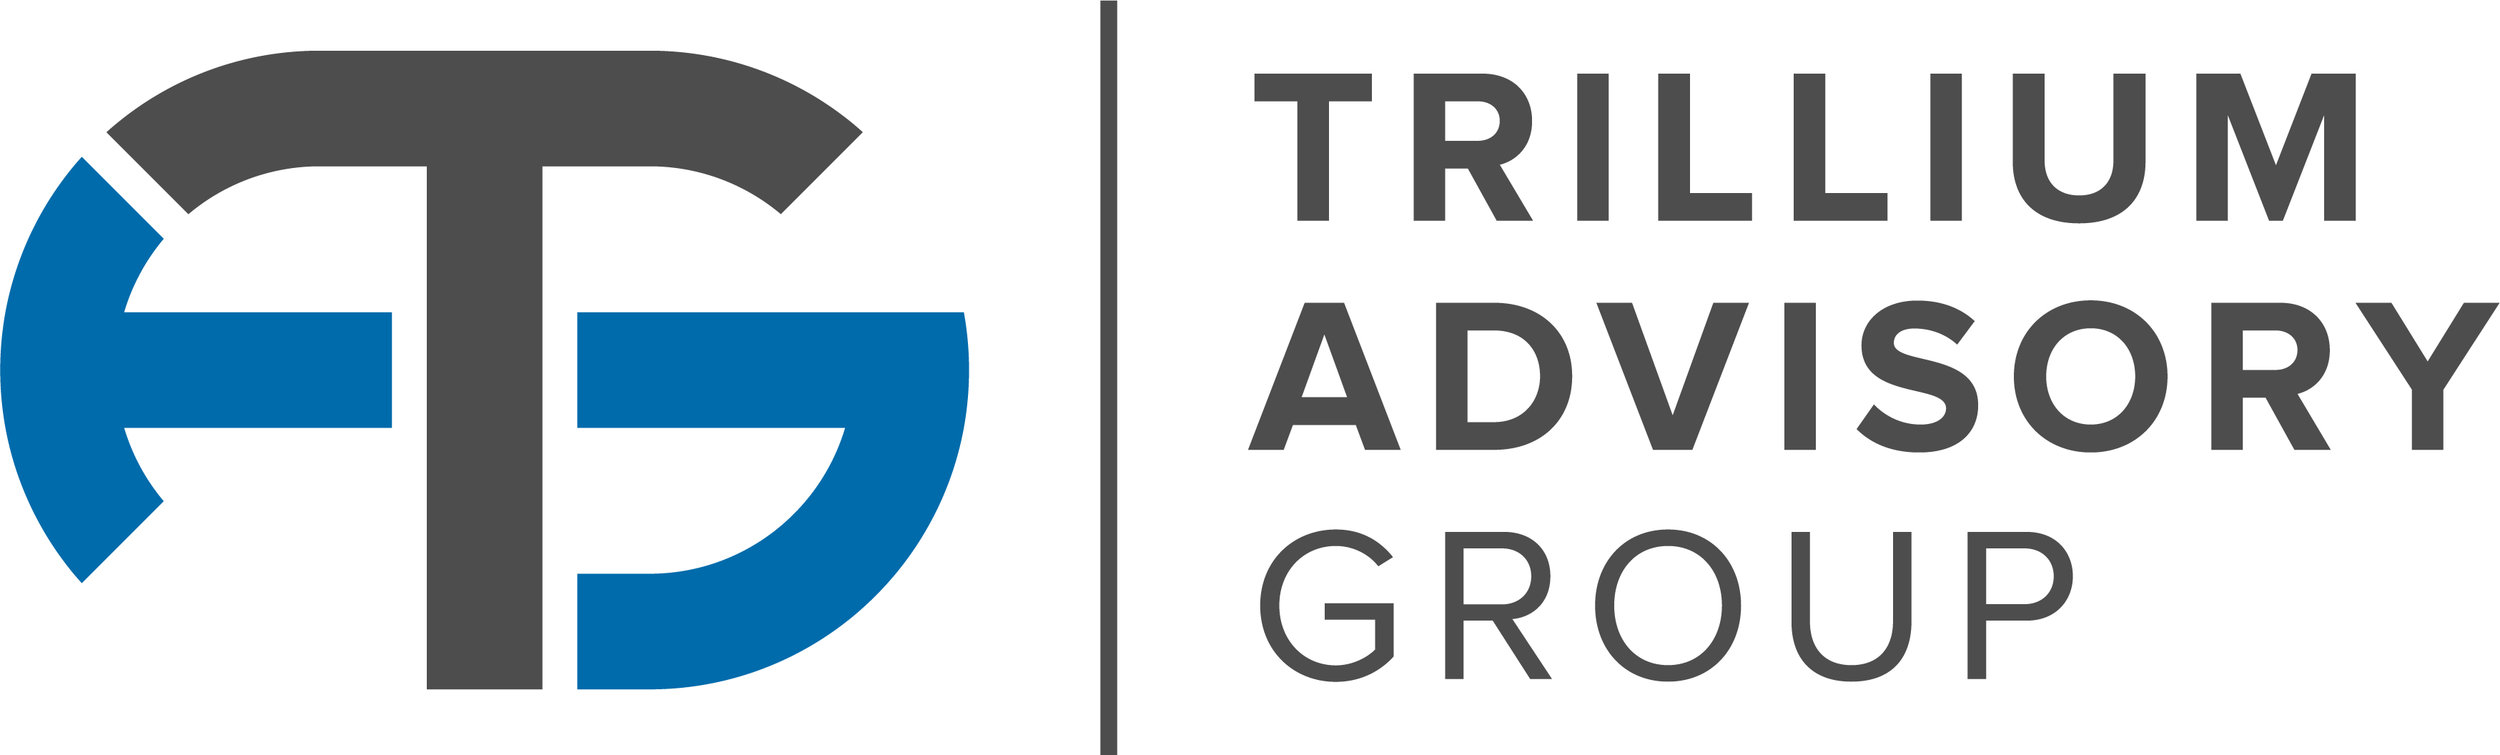 TRILLIUM ADVISORY GROUP LOGO.jpg